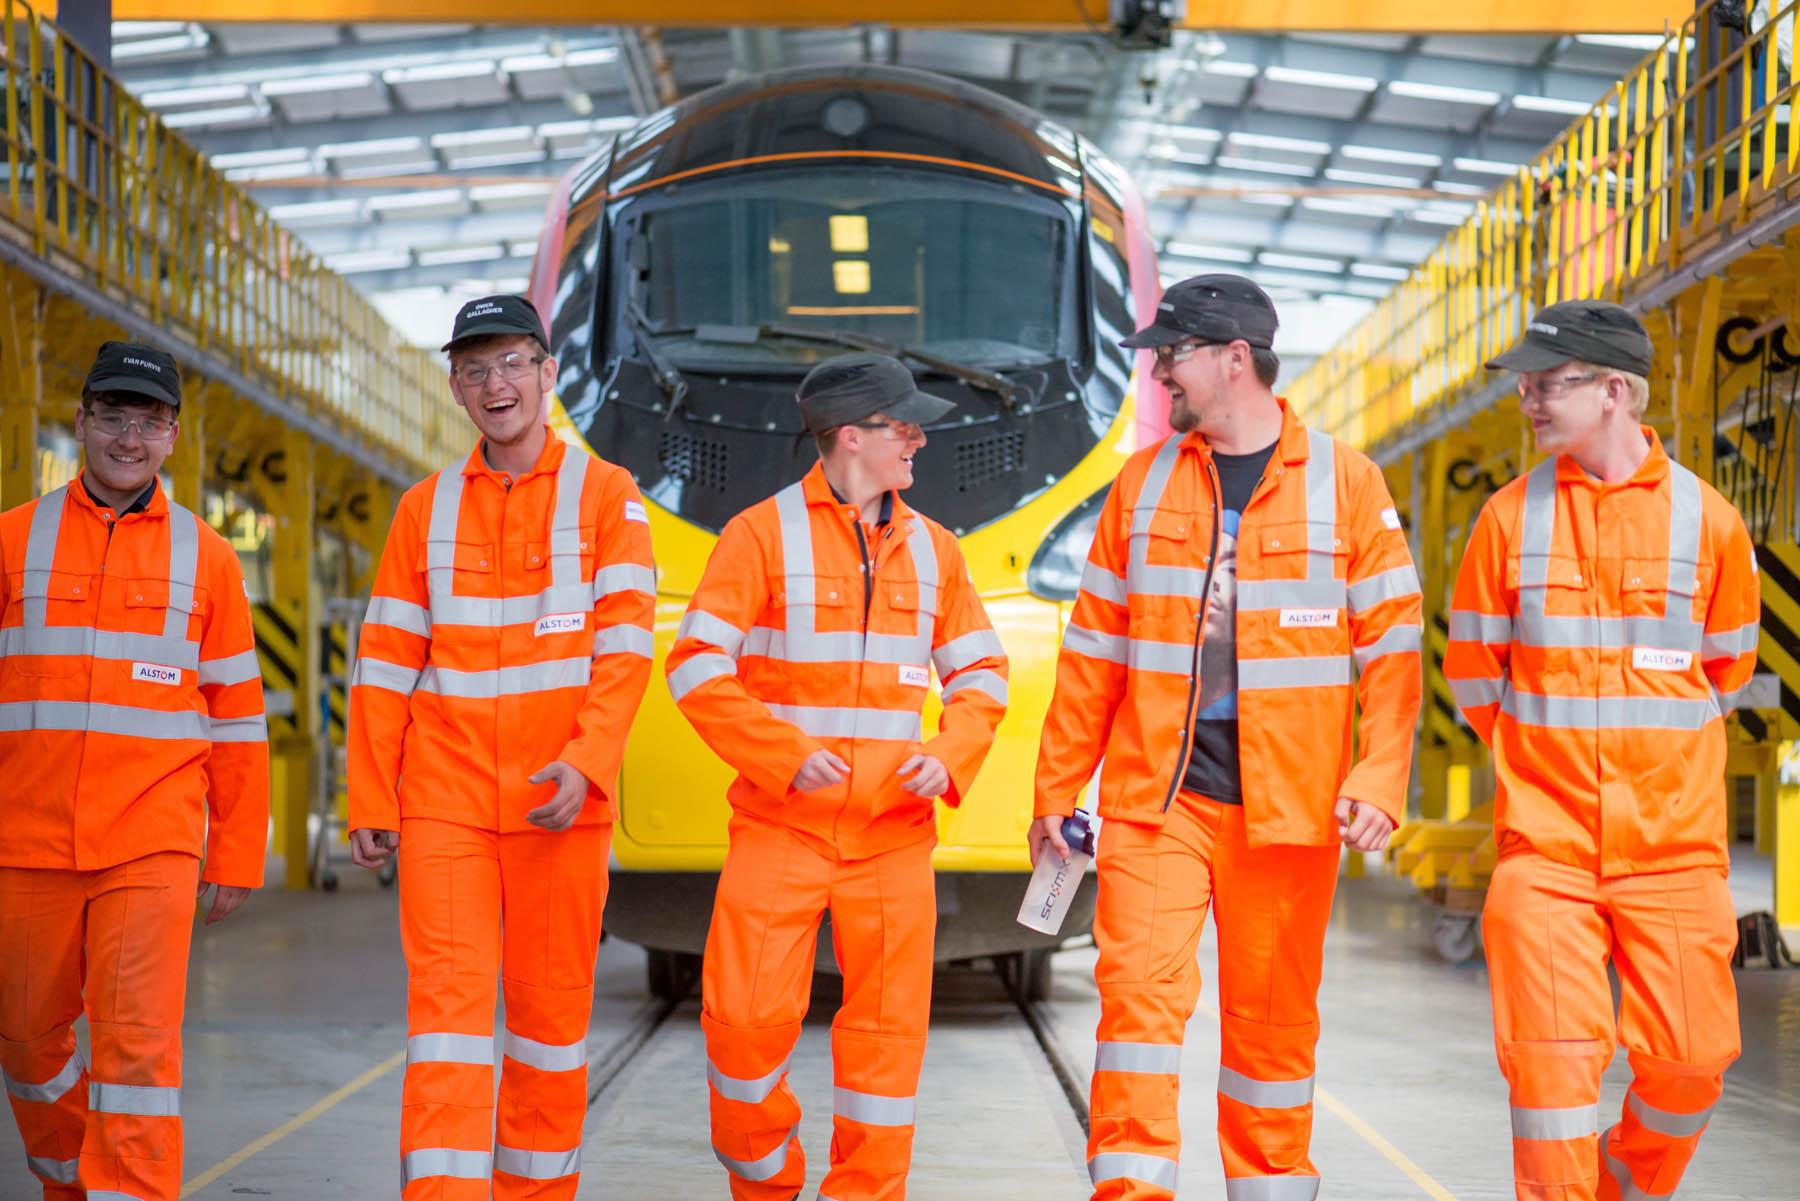 Apprentices at Alstom Train Care Depot, Liverpool